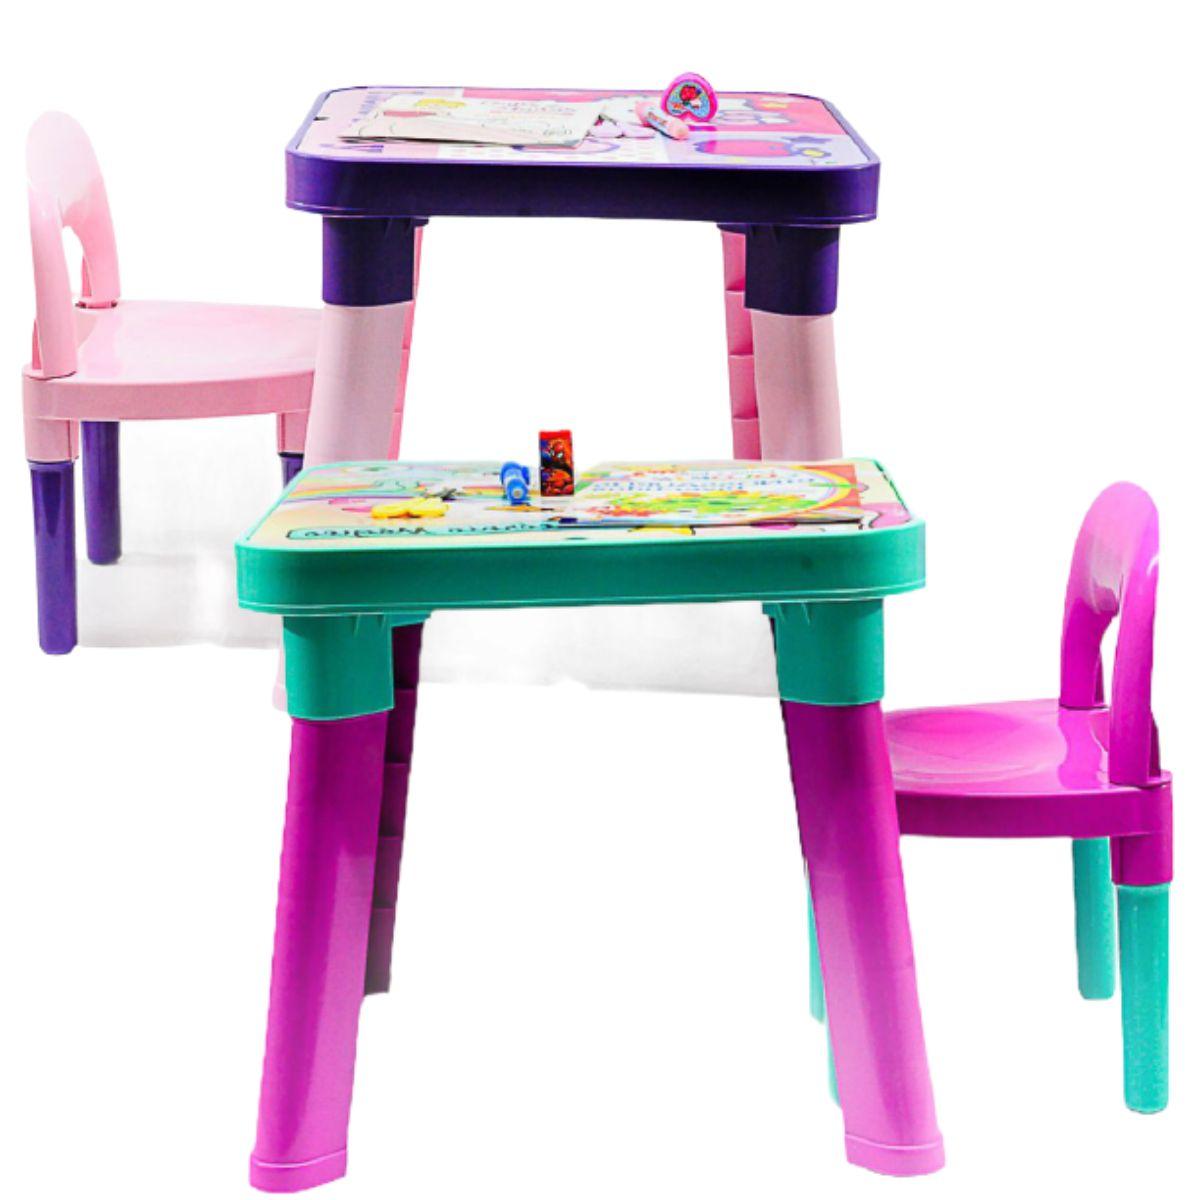 Mesa Hello Kitty/Unicórnio de leitura e atividades completa com 21 itens